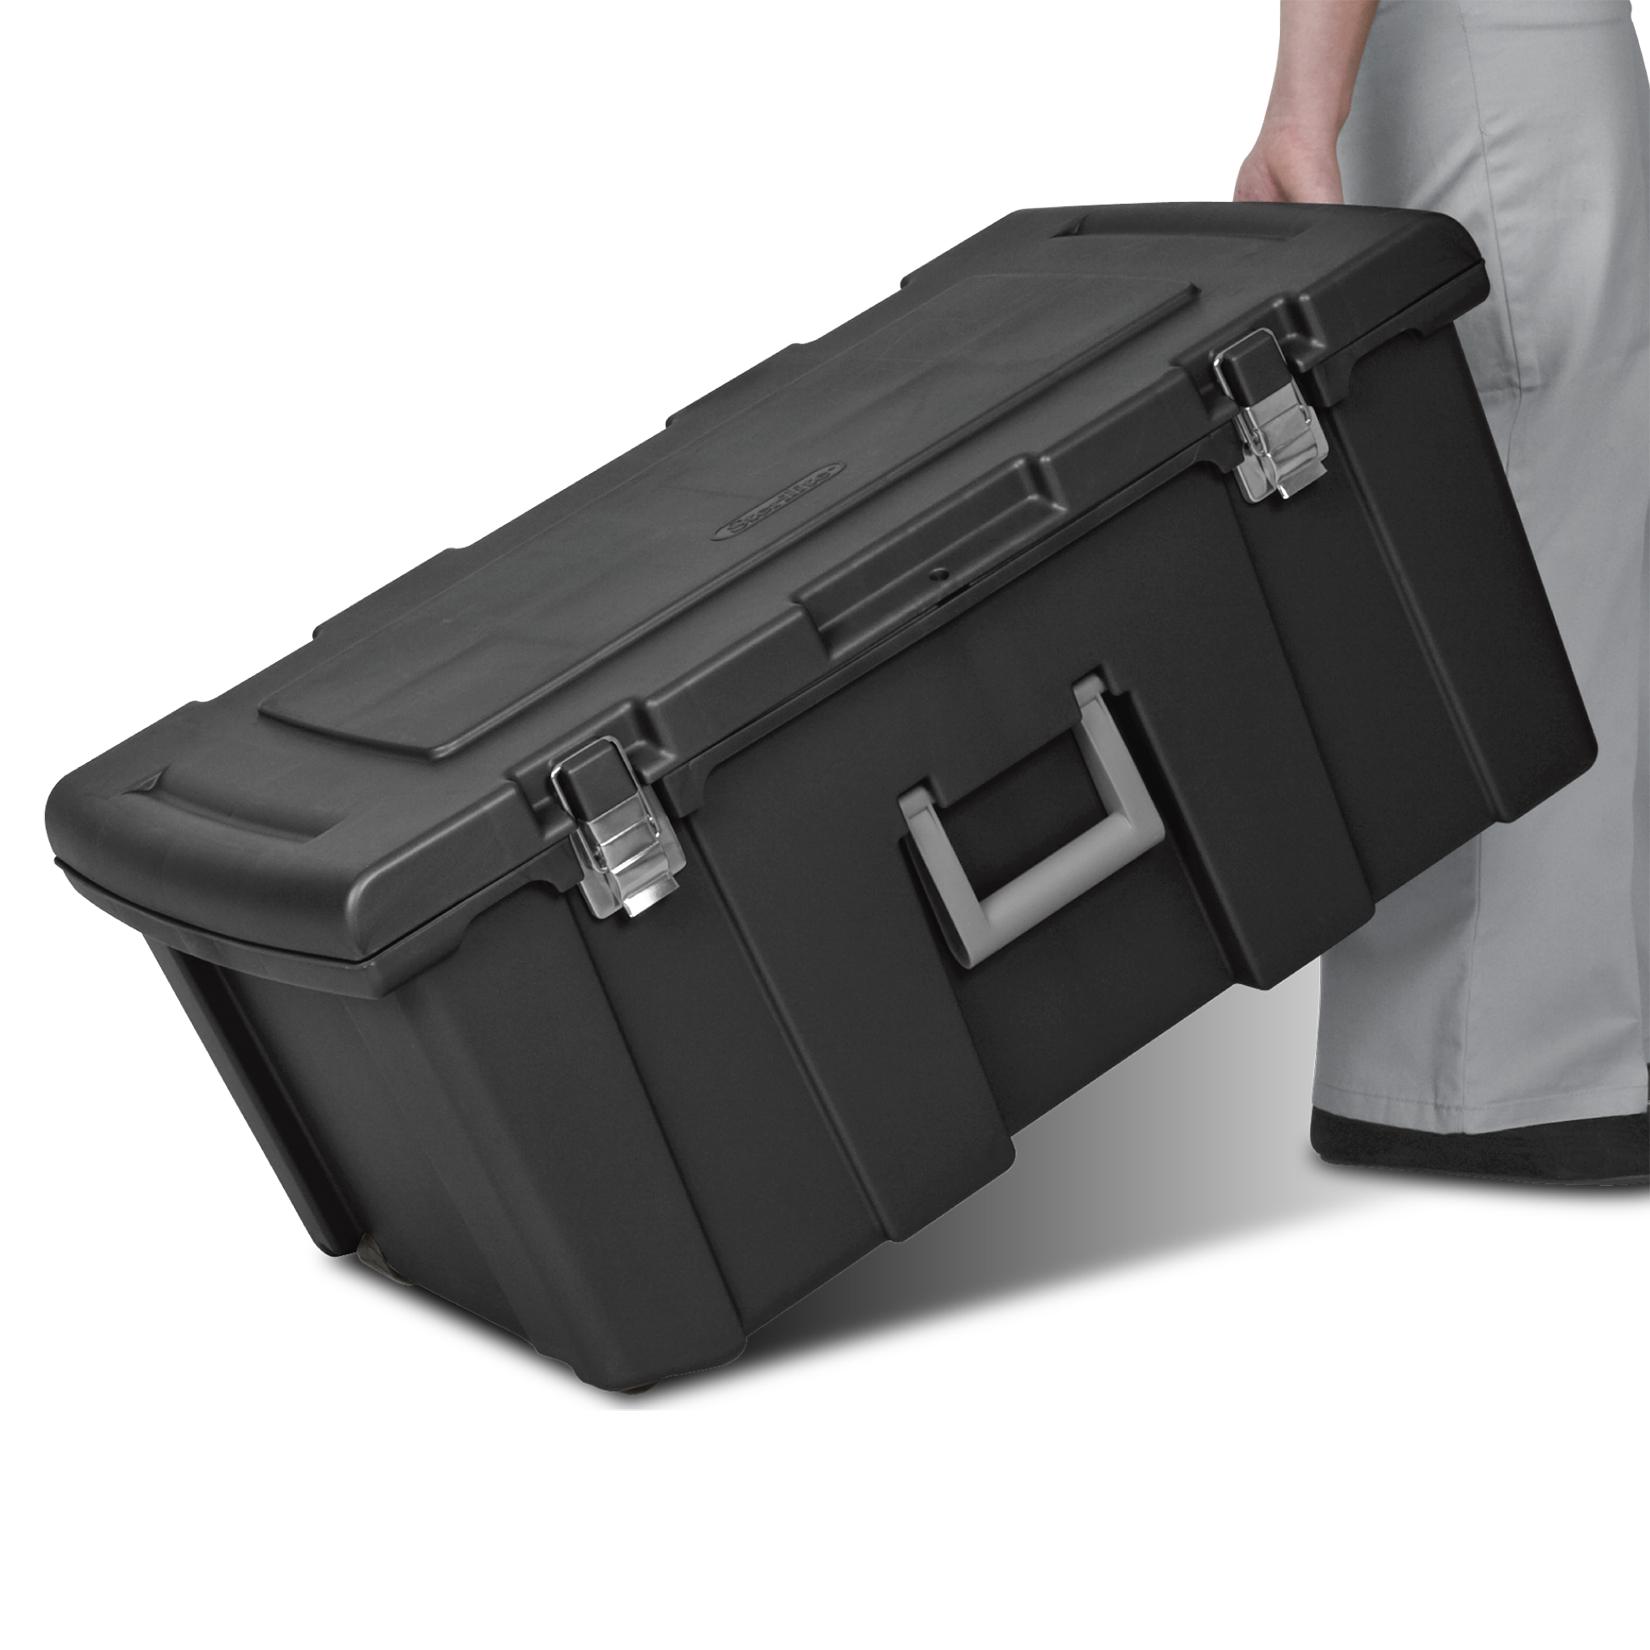 16-Gallon Sterilite Footlocker Storage Box w/ Wheels $16.46